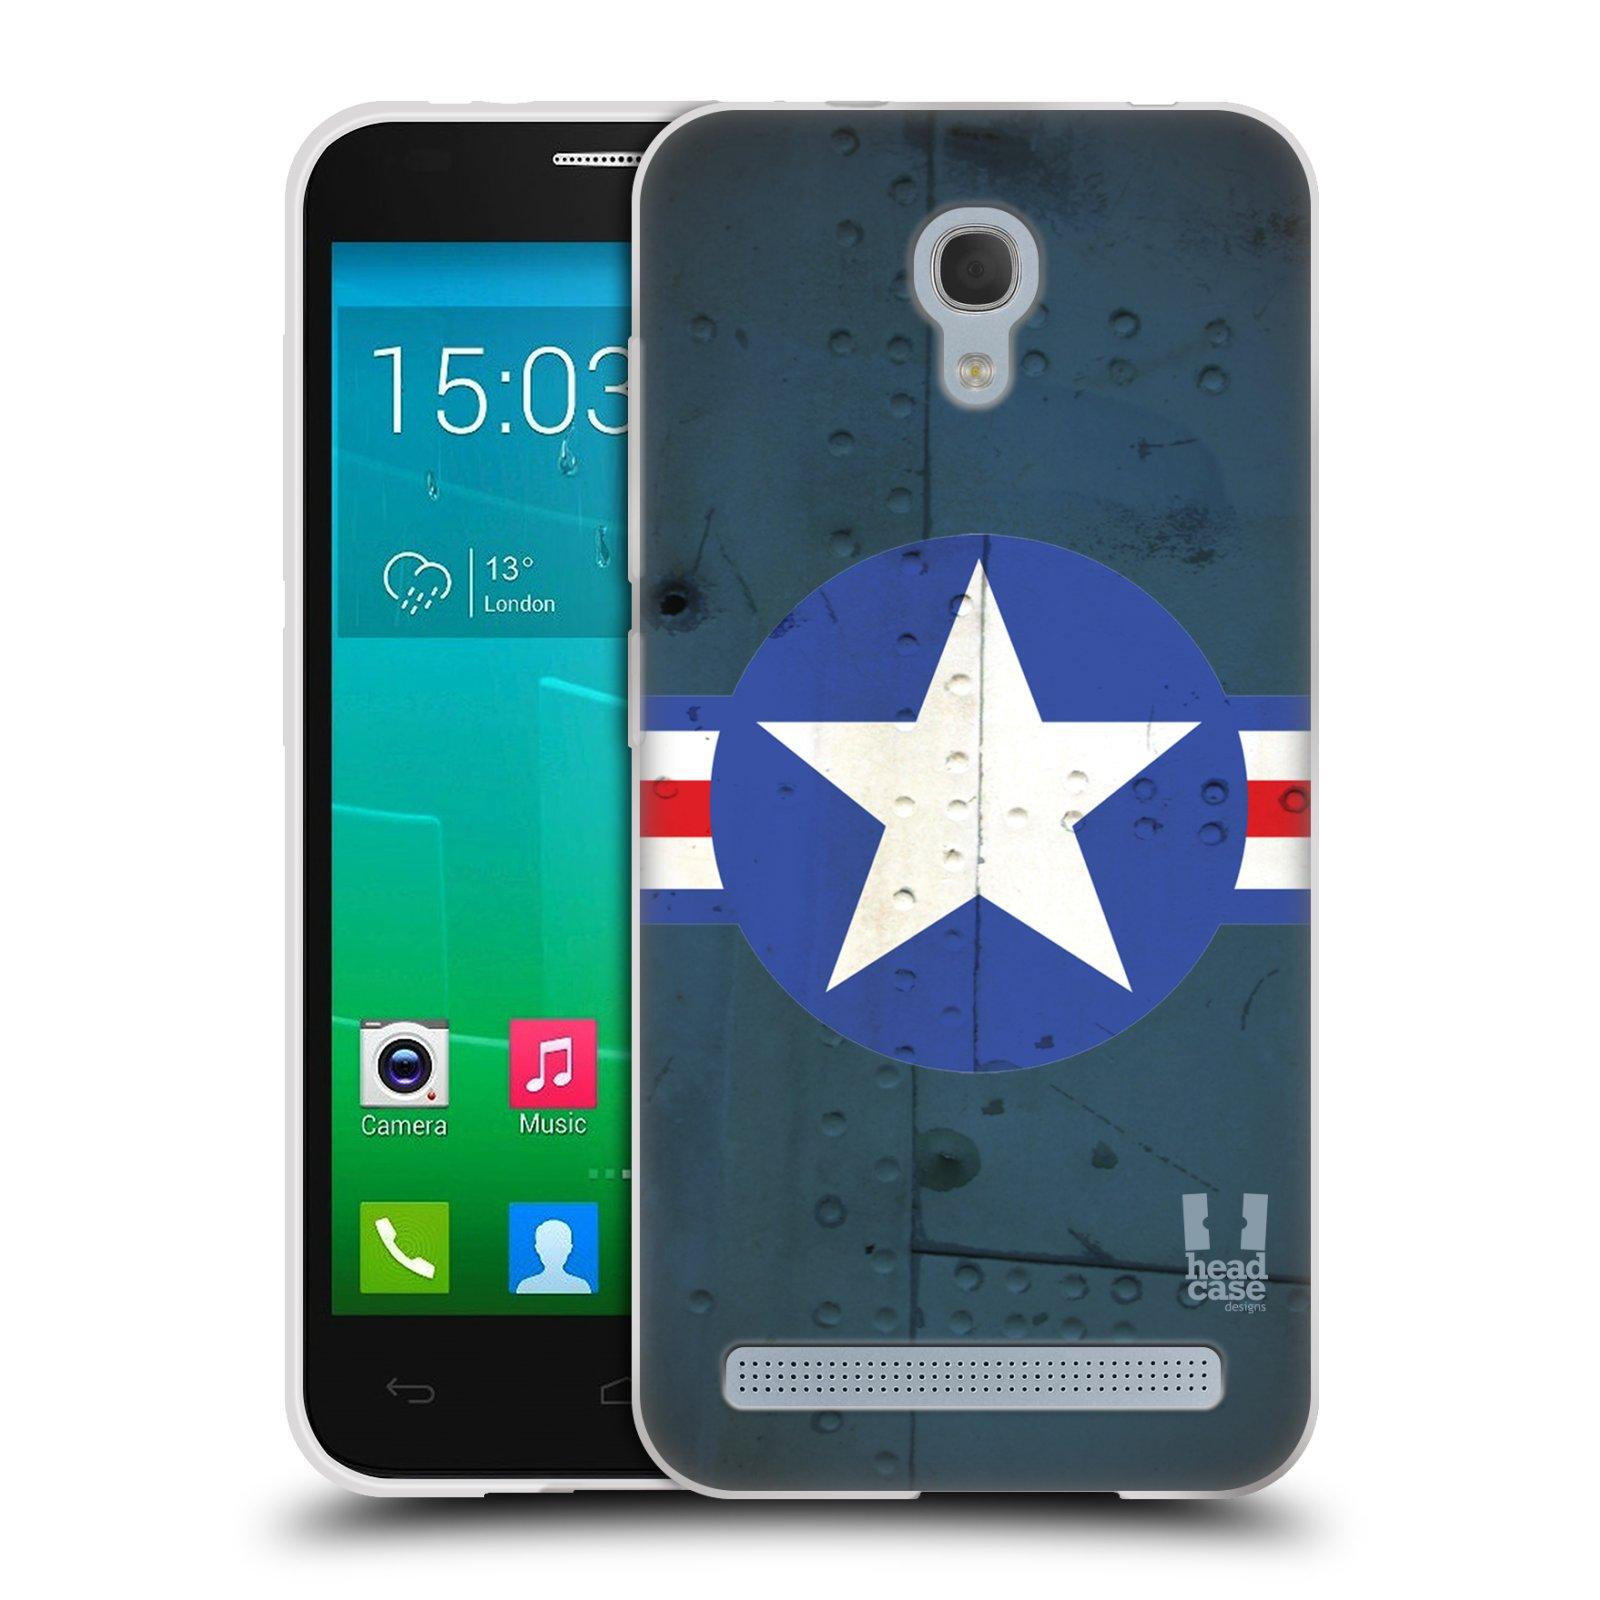 Silikonové pouzdro na mobil Alcatel One Touch Idol 2 Mini S 6036Y HEAD CASE POSTWAR (Silikonový kryt či obal na mobilní telefon Alcatel Idol 2 Mini S OT-6036Y)